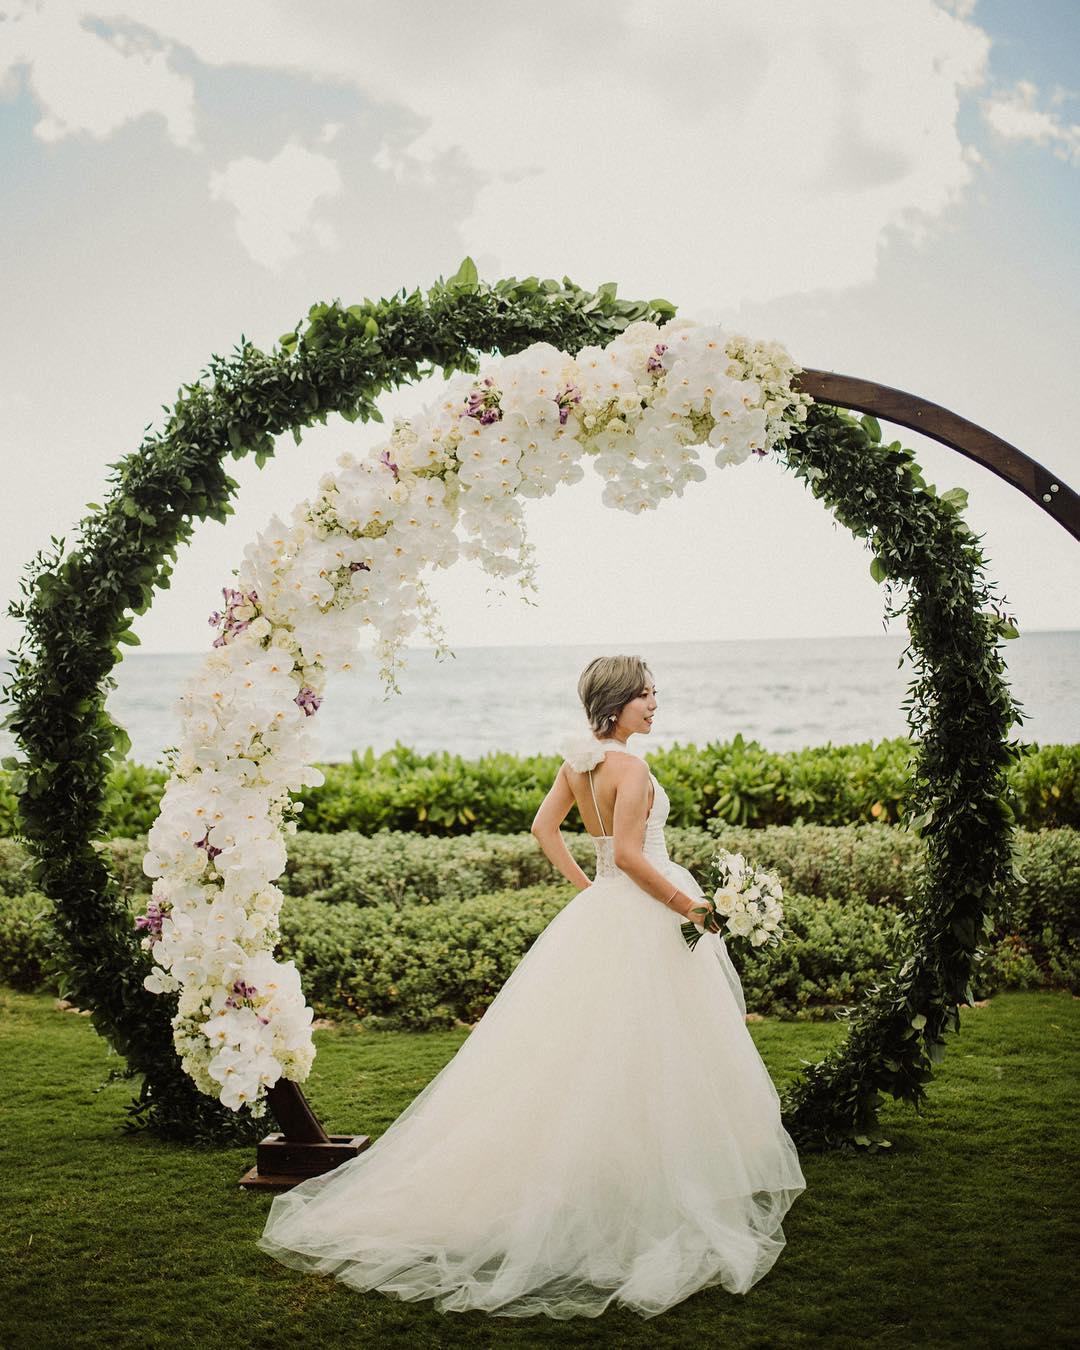 5 Well Travelled Bride Christie Pham Wedding Photographer Hawaii.jpg